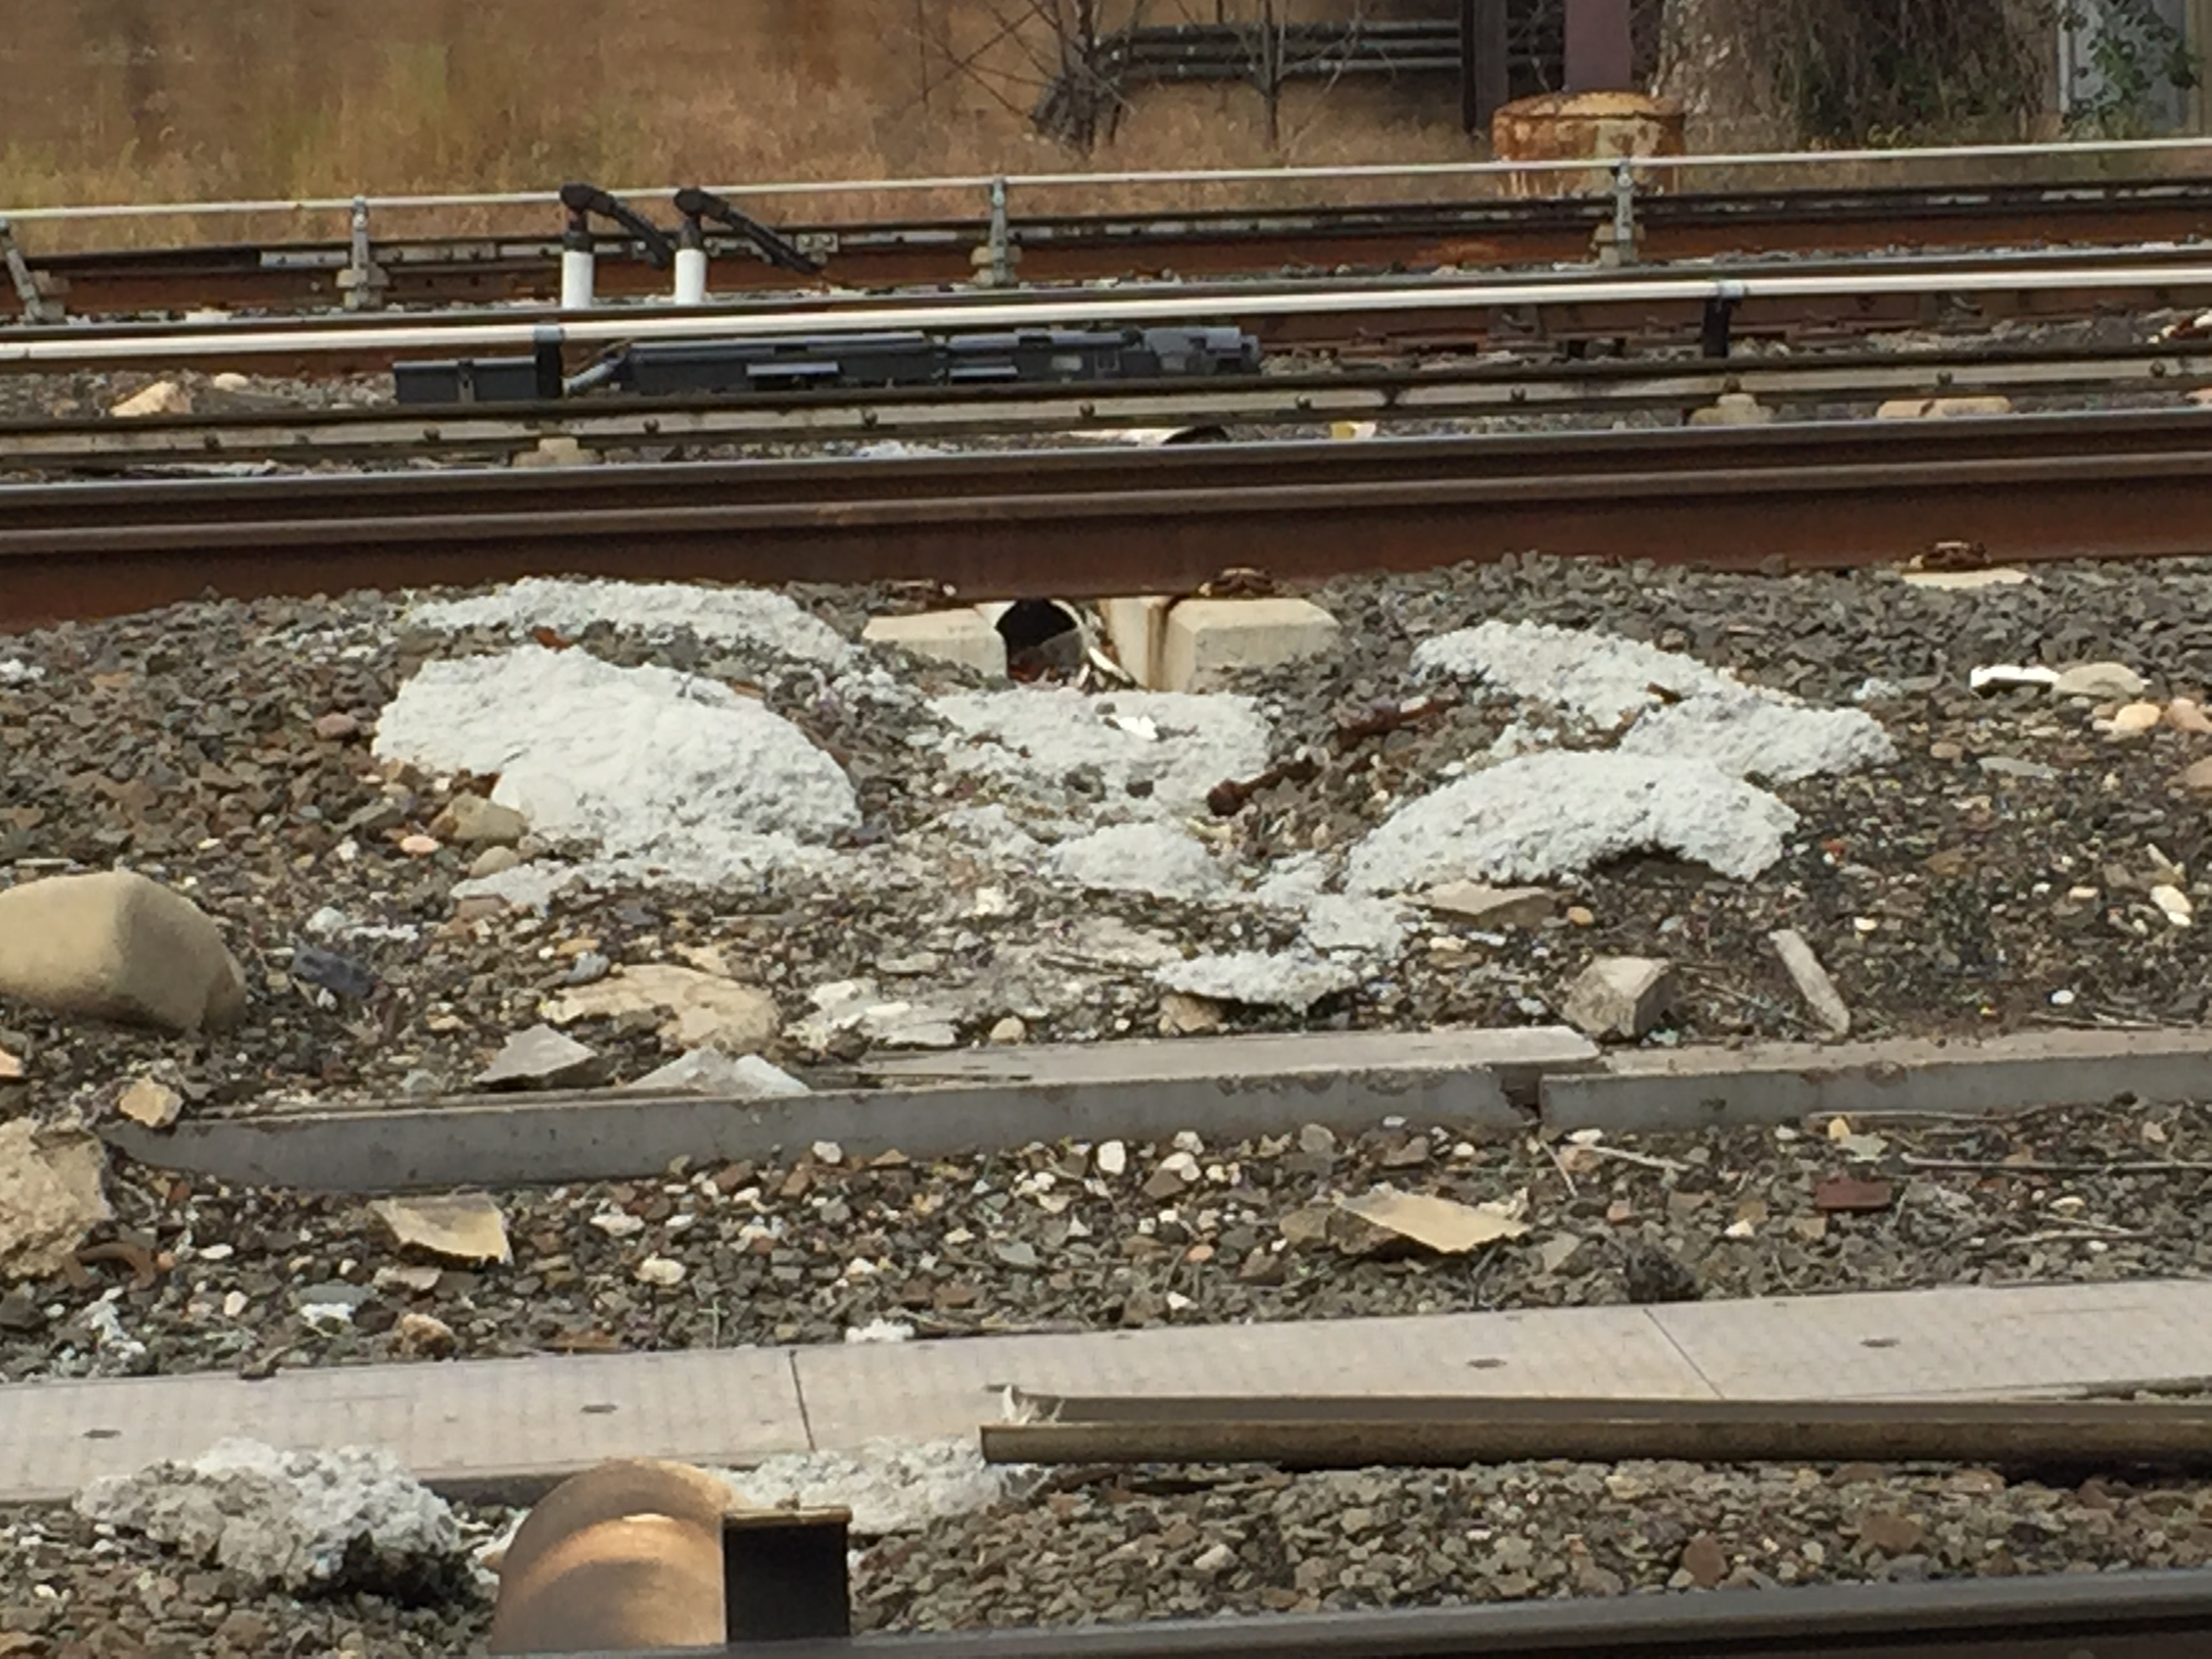 FELA violaton at railroad job site leads to injury